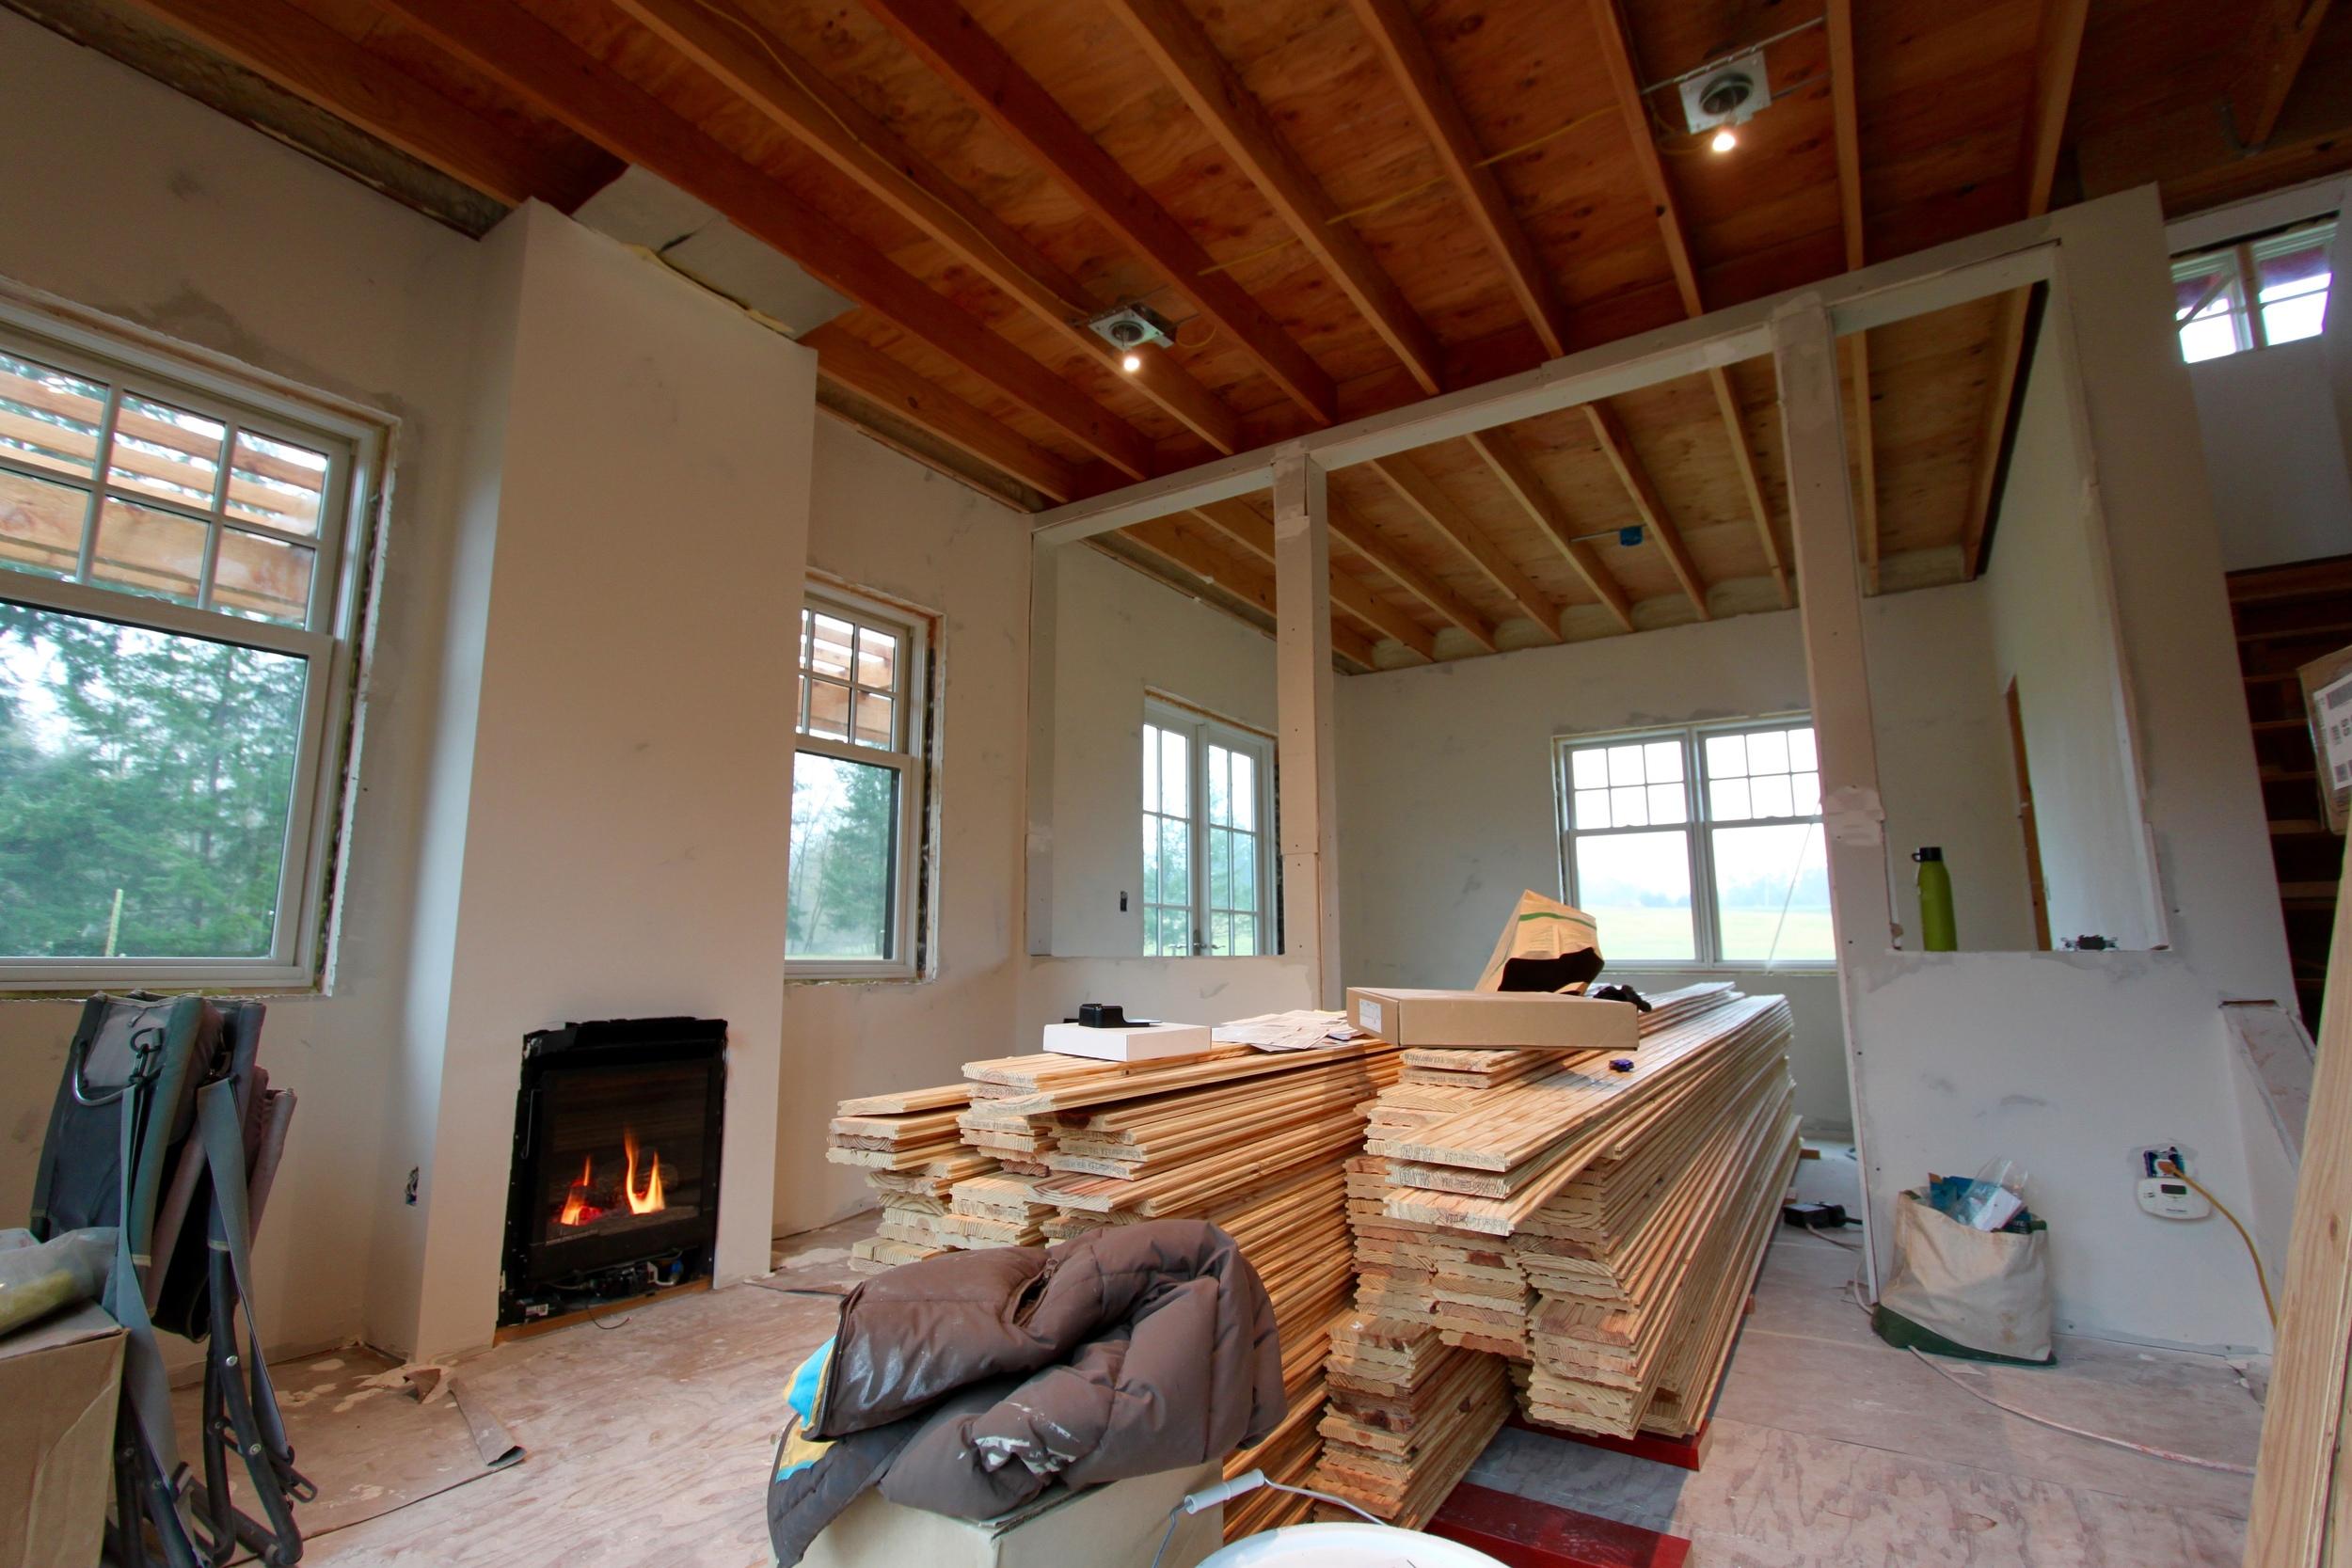 valor seantor fireplace